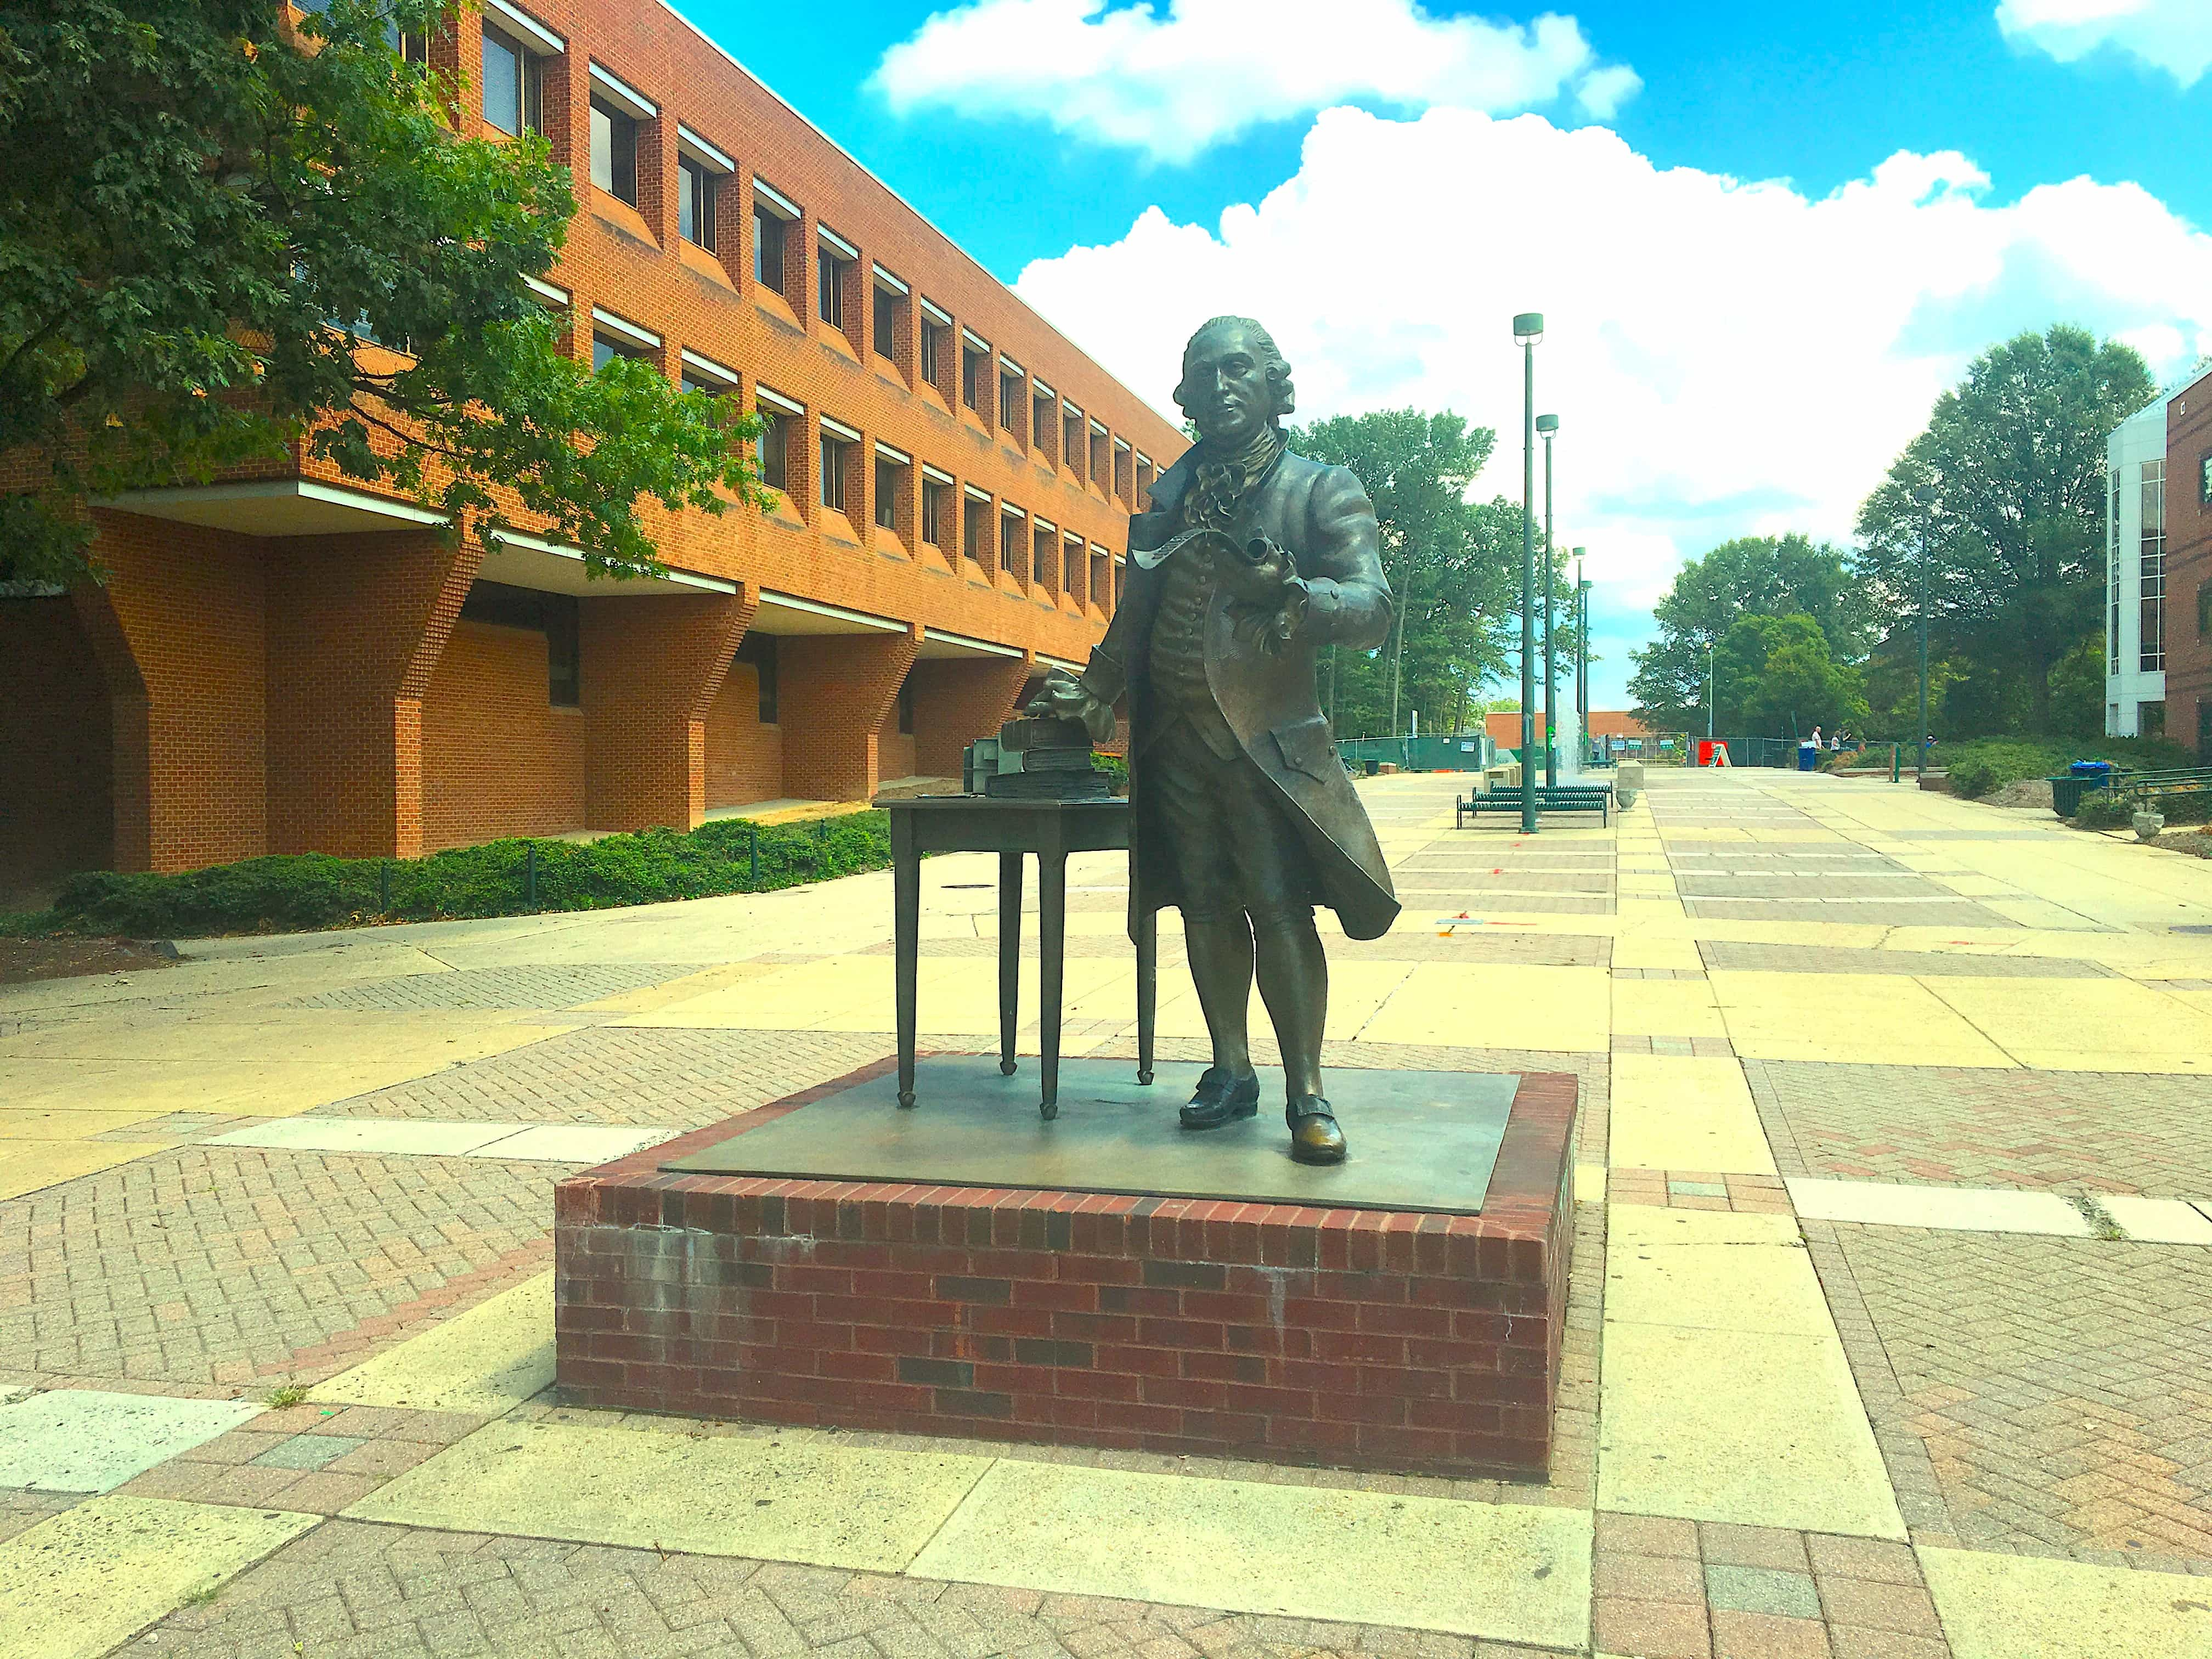 Image of George Mason statue at George Mason University